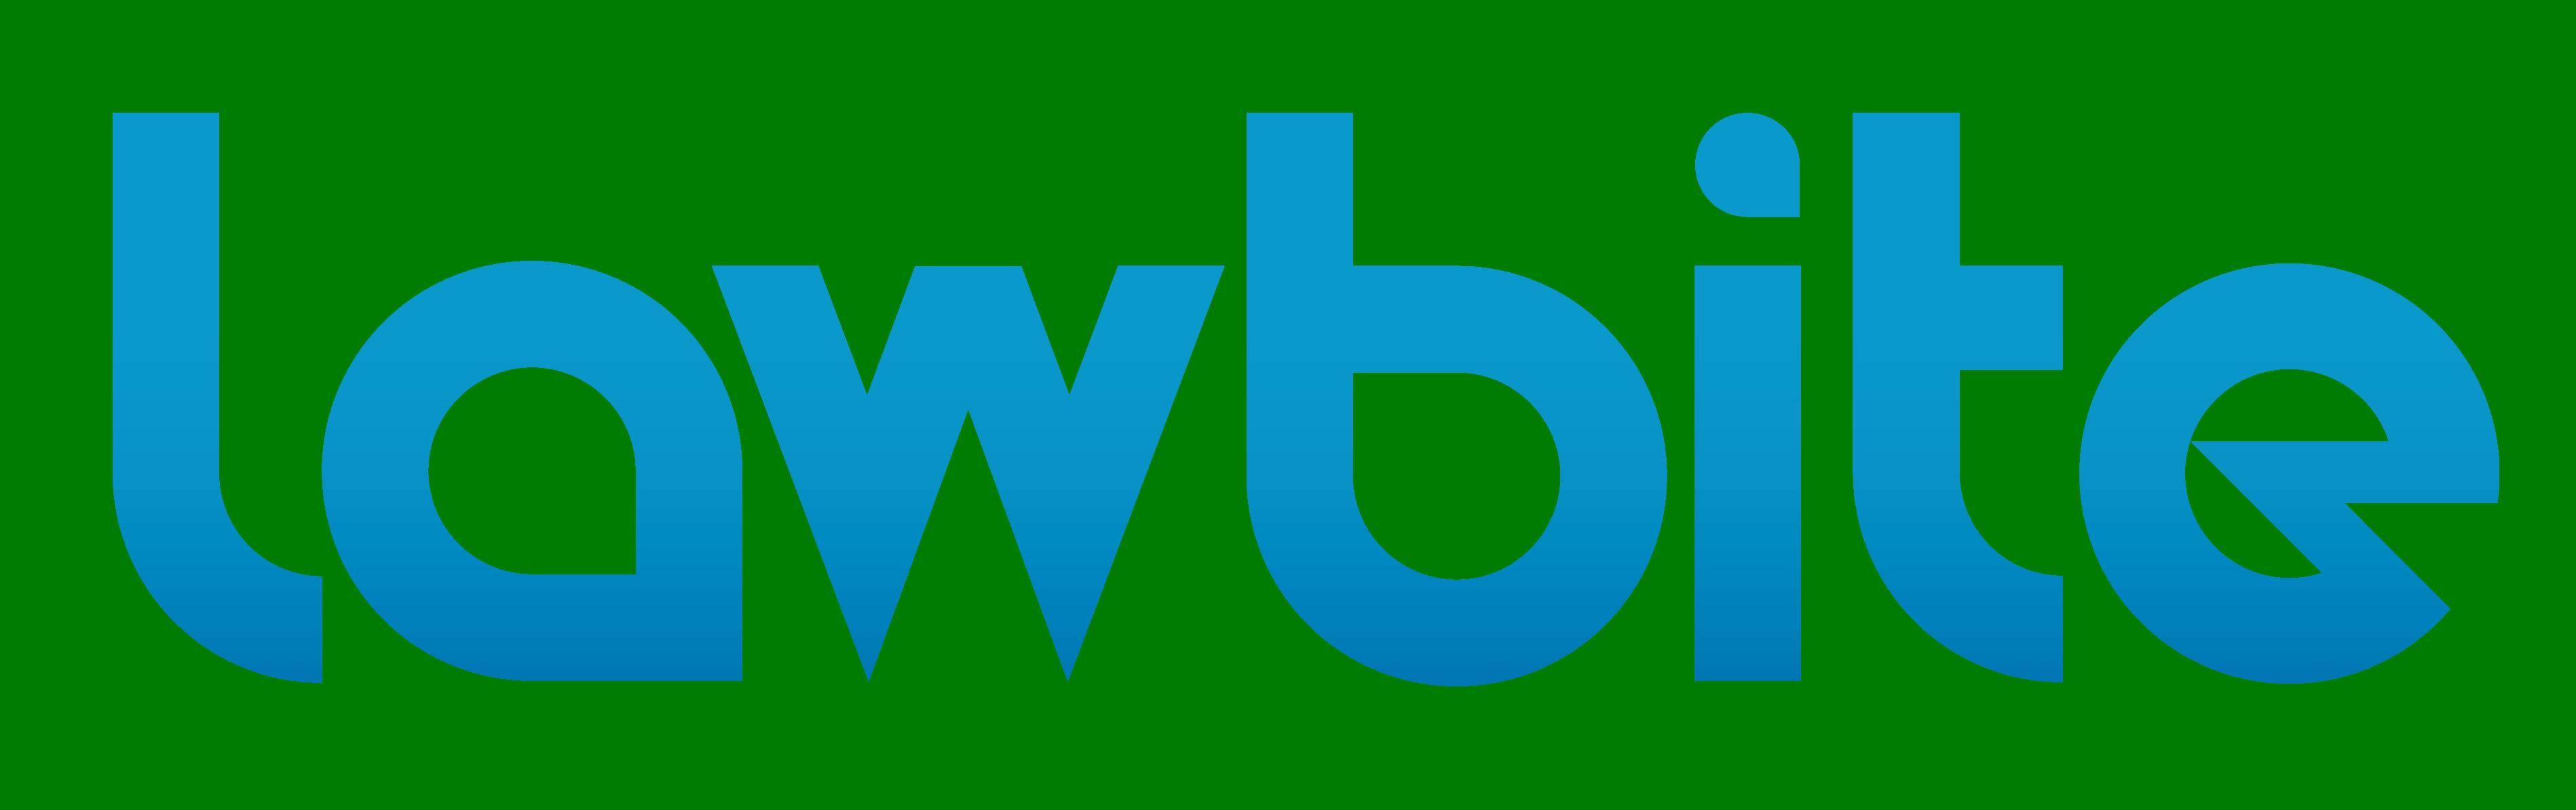 Logos Blue